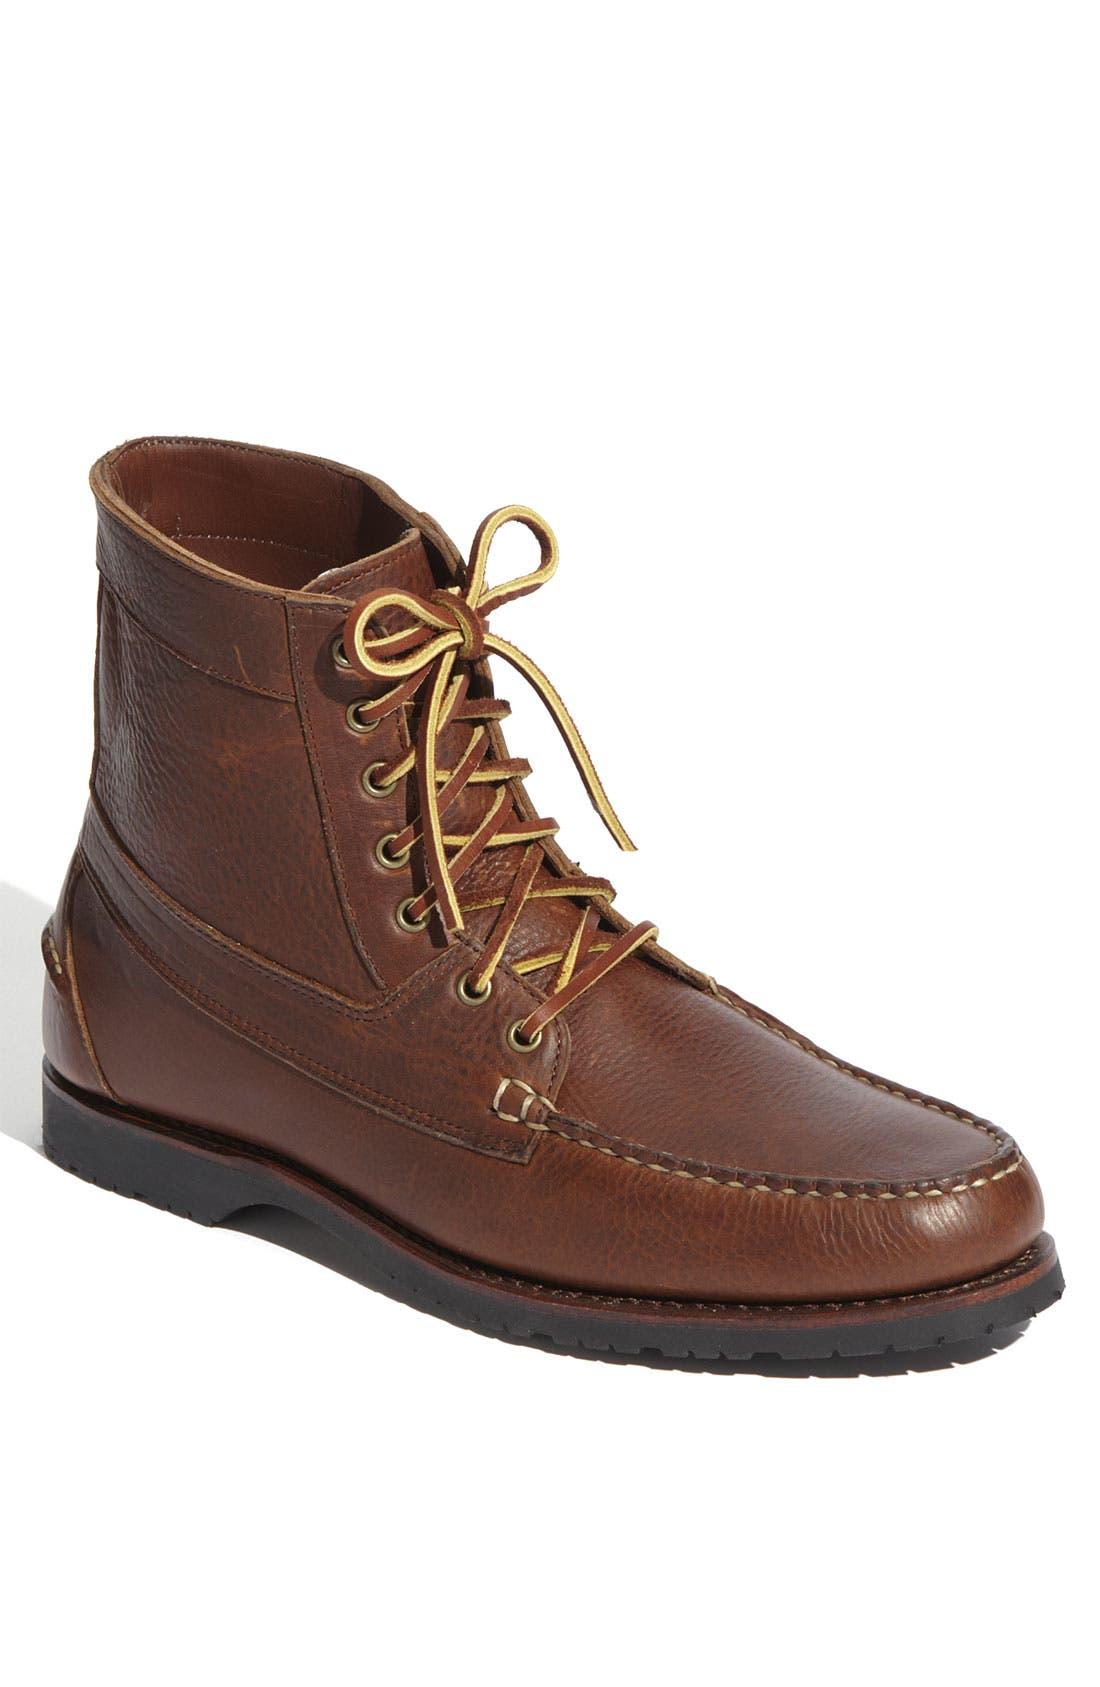 Main Image - Allen Edmonds 'Yuma' Boot